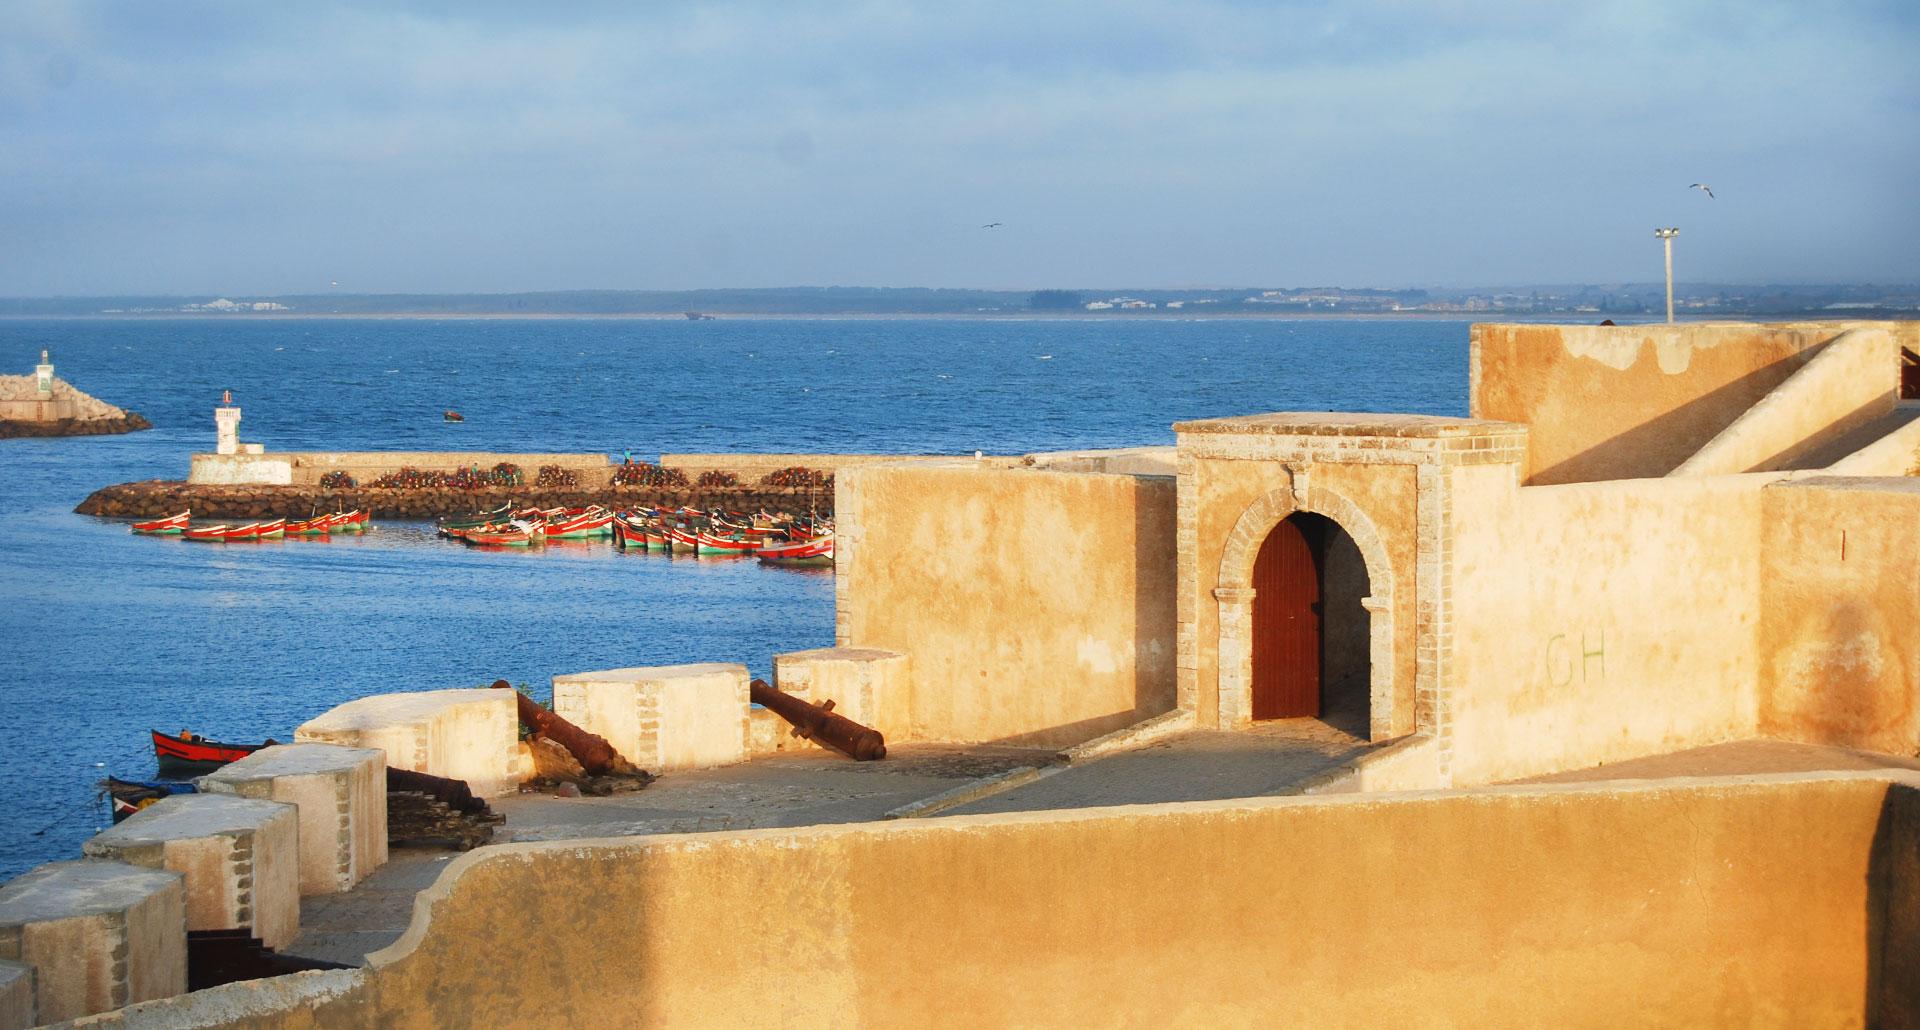 Coastal Morocco